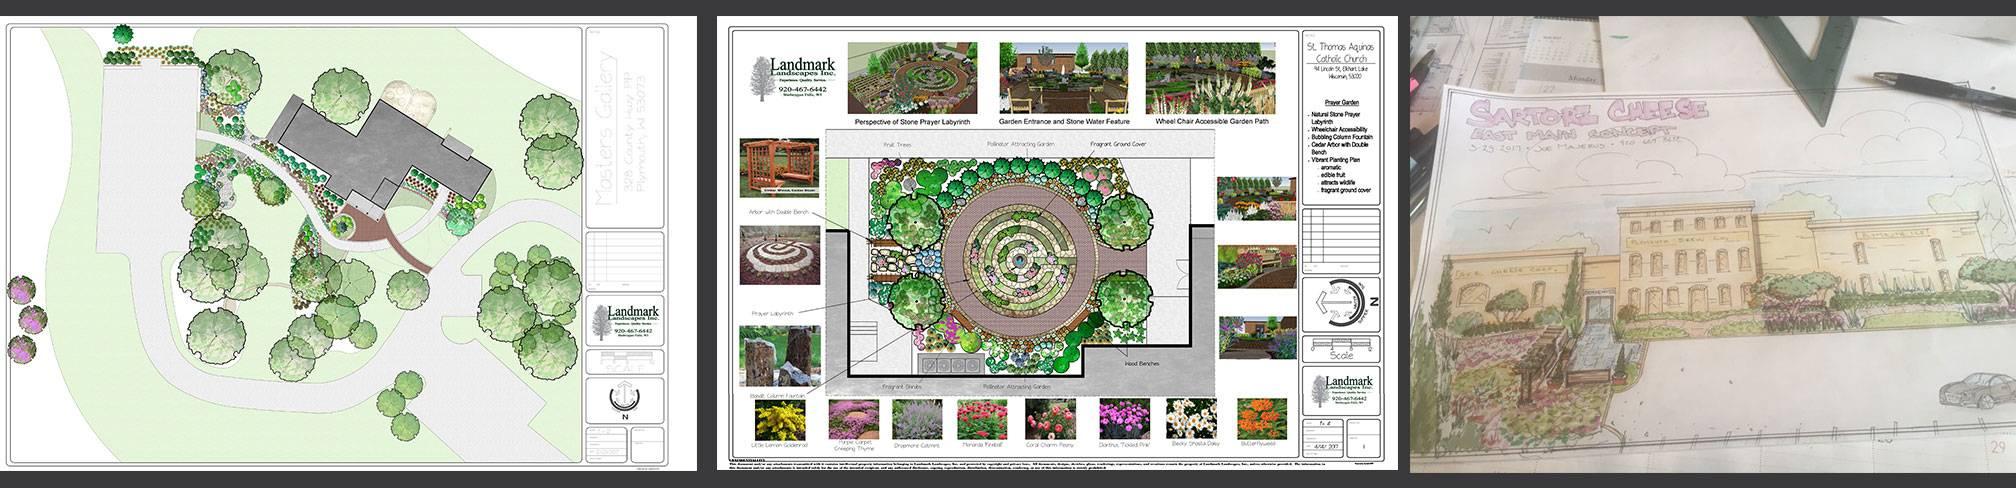 https://landmarklandscapes.pro/wp-content/uploads/2018/04/corp-design.jpg